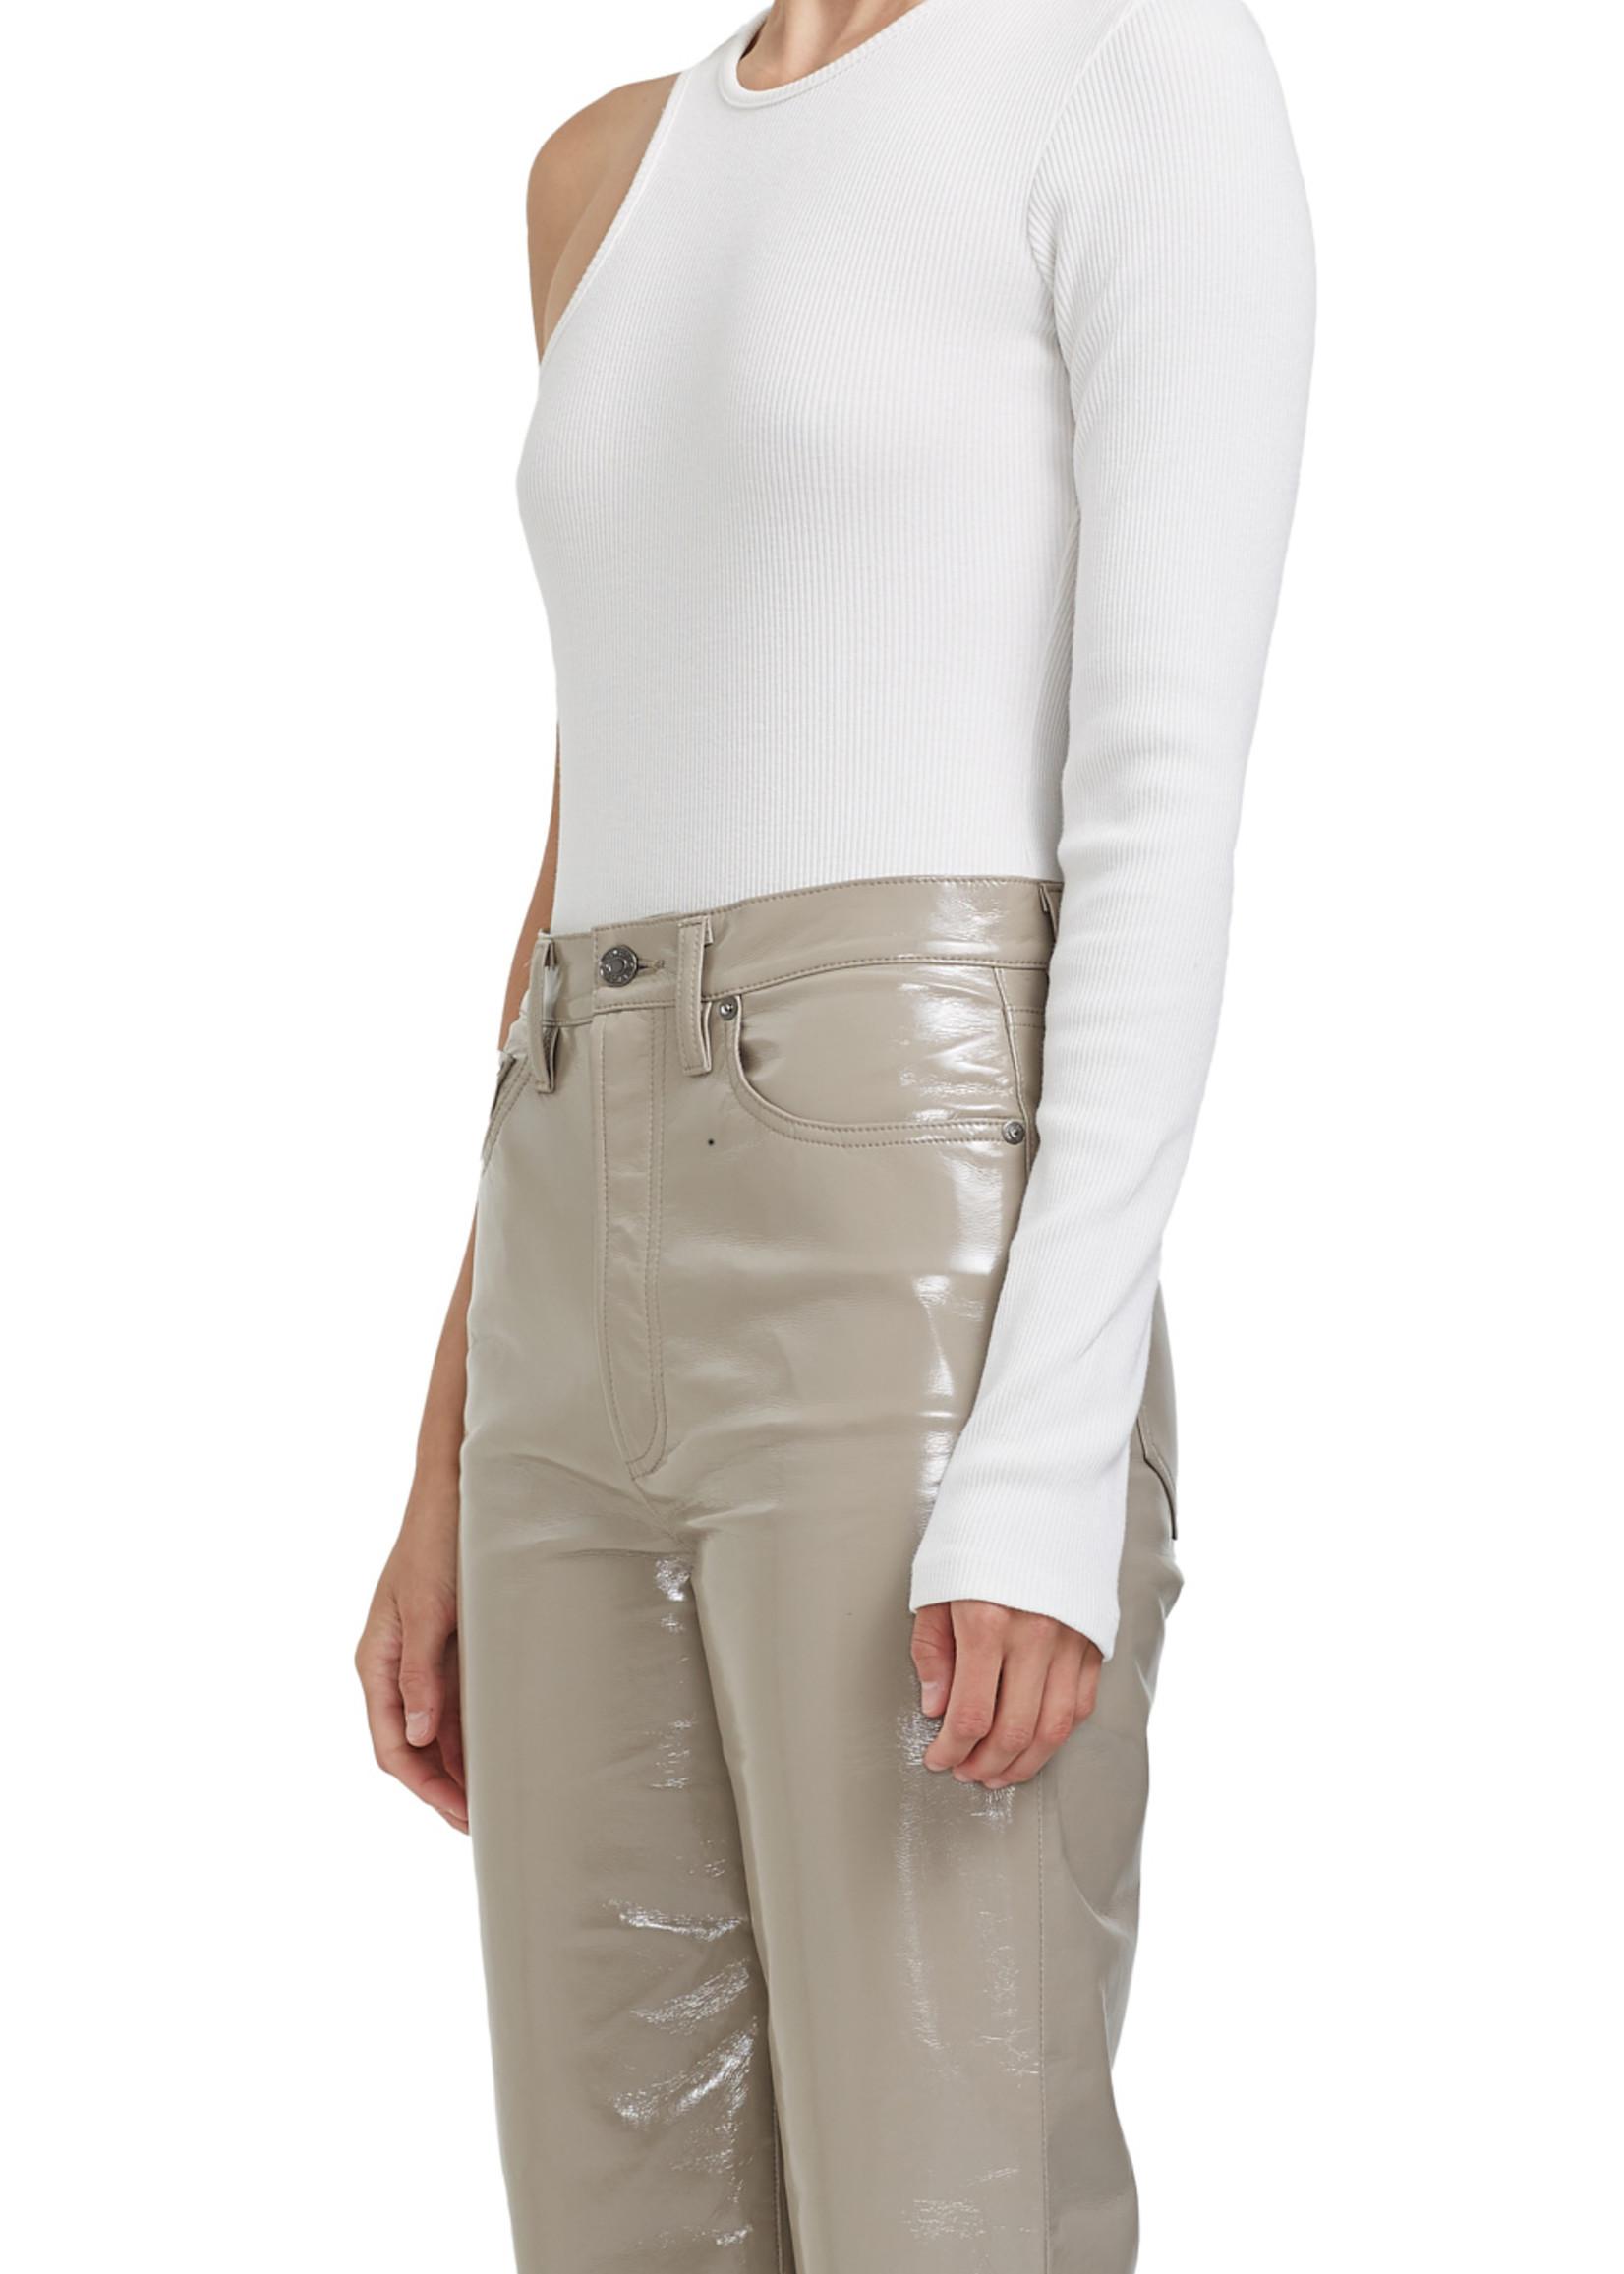 AGOLDE Bea One Sleeve Bodysuit in White